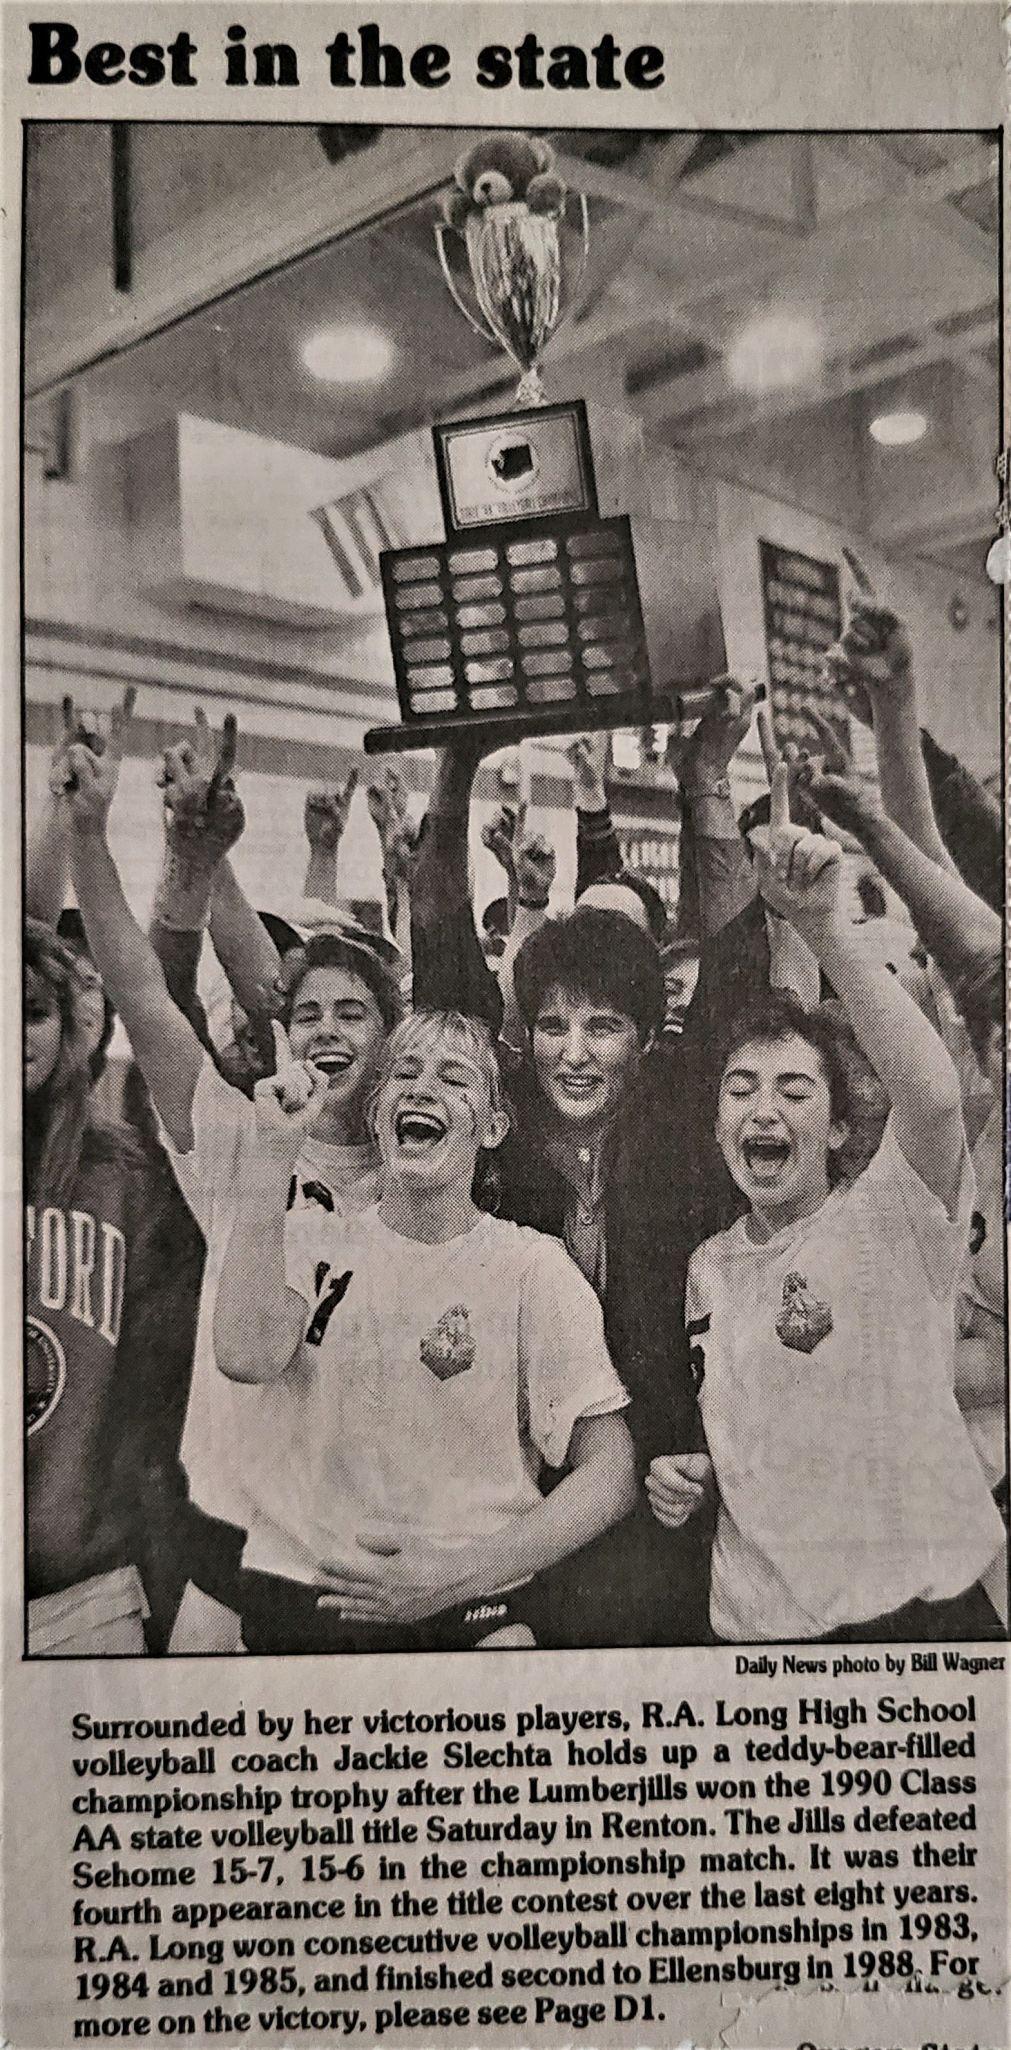 Trophy overhead